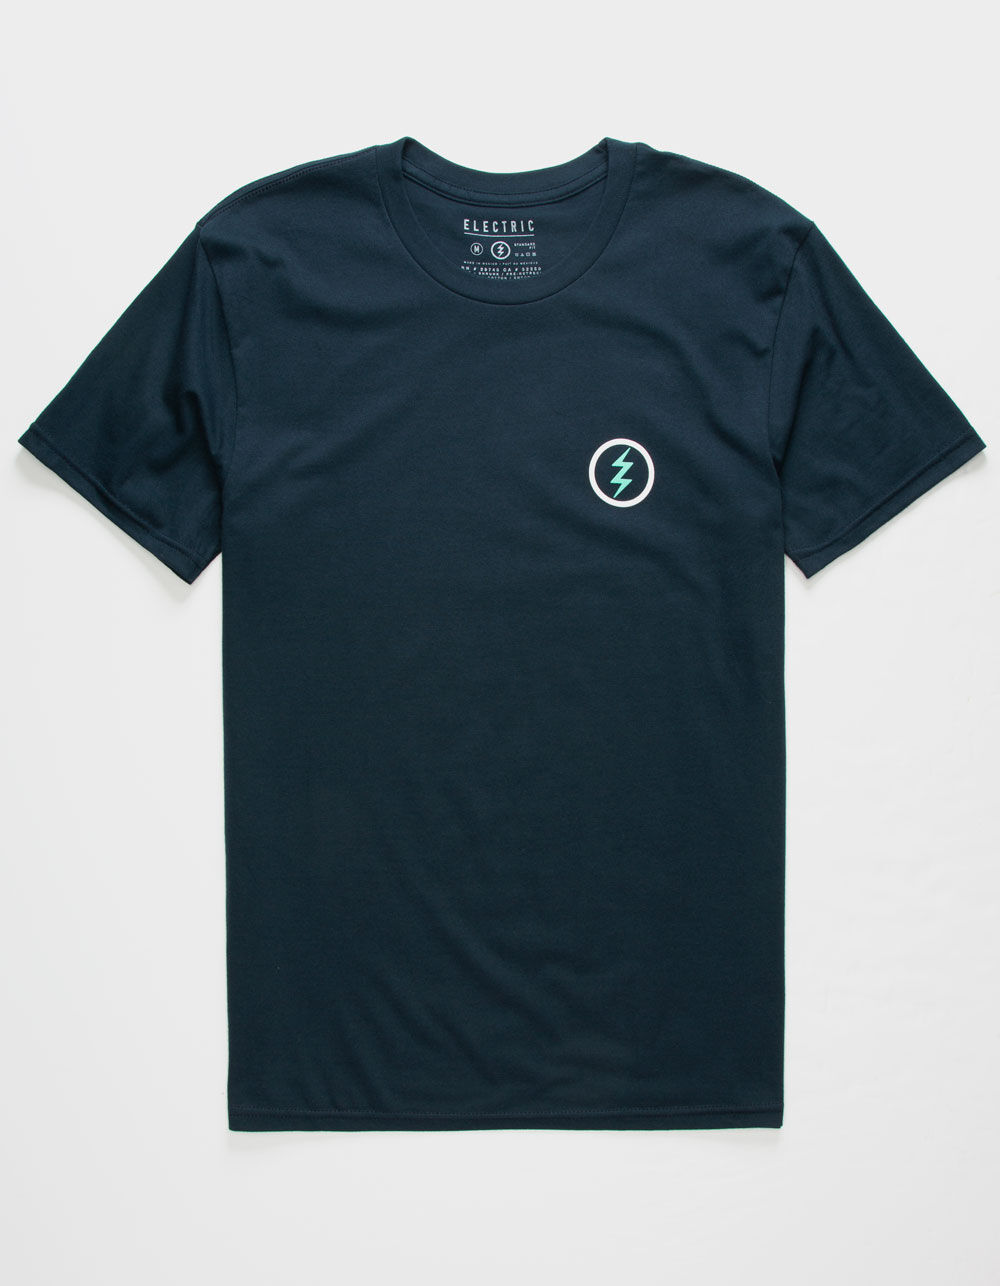 ELECTRIC Volt Navy T-Shirt